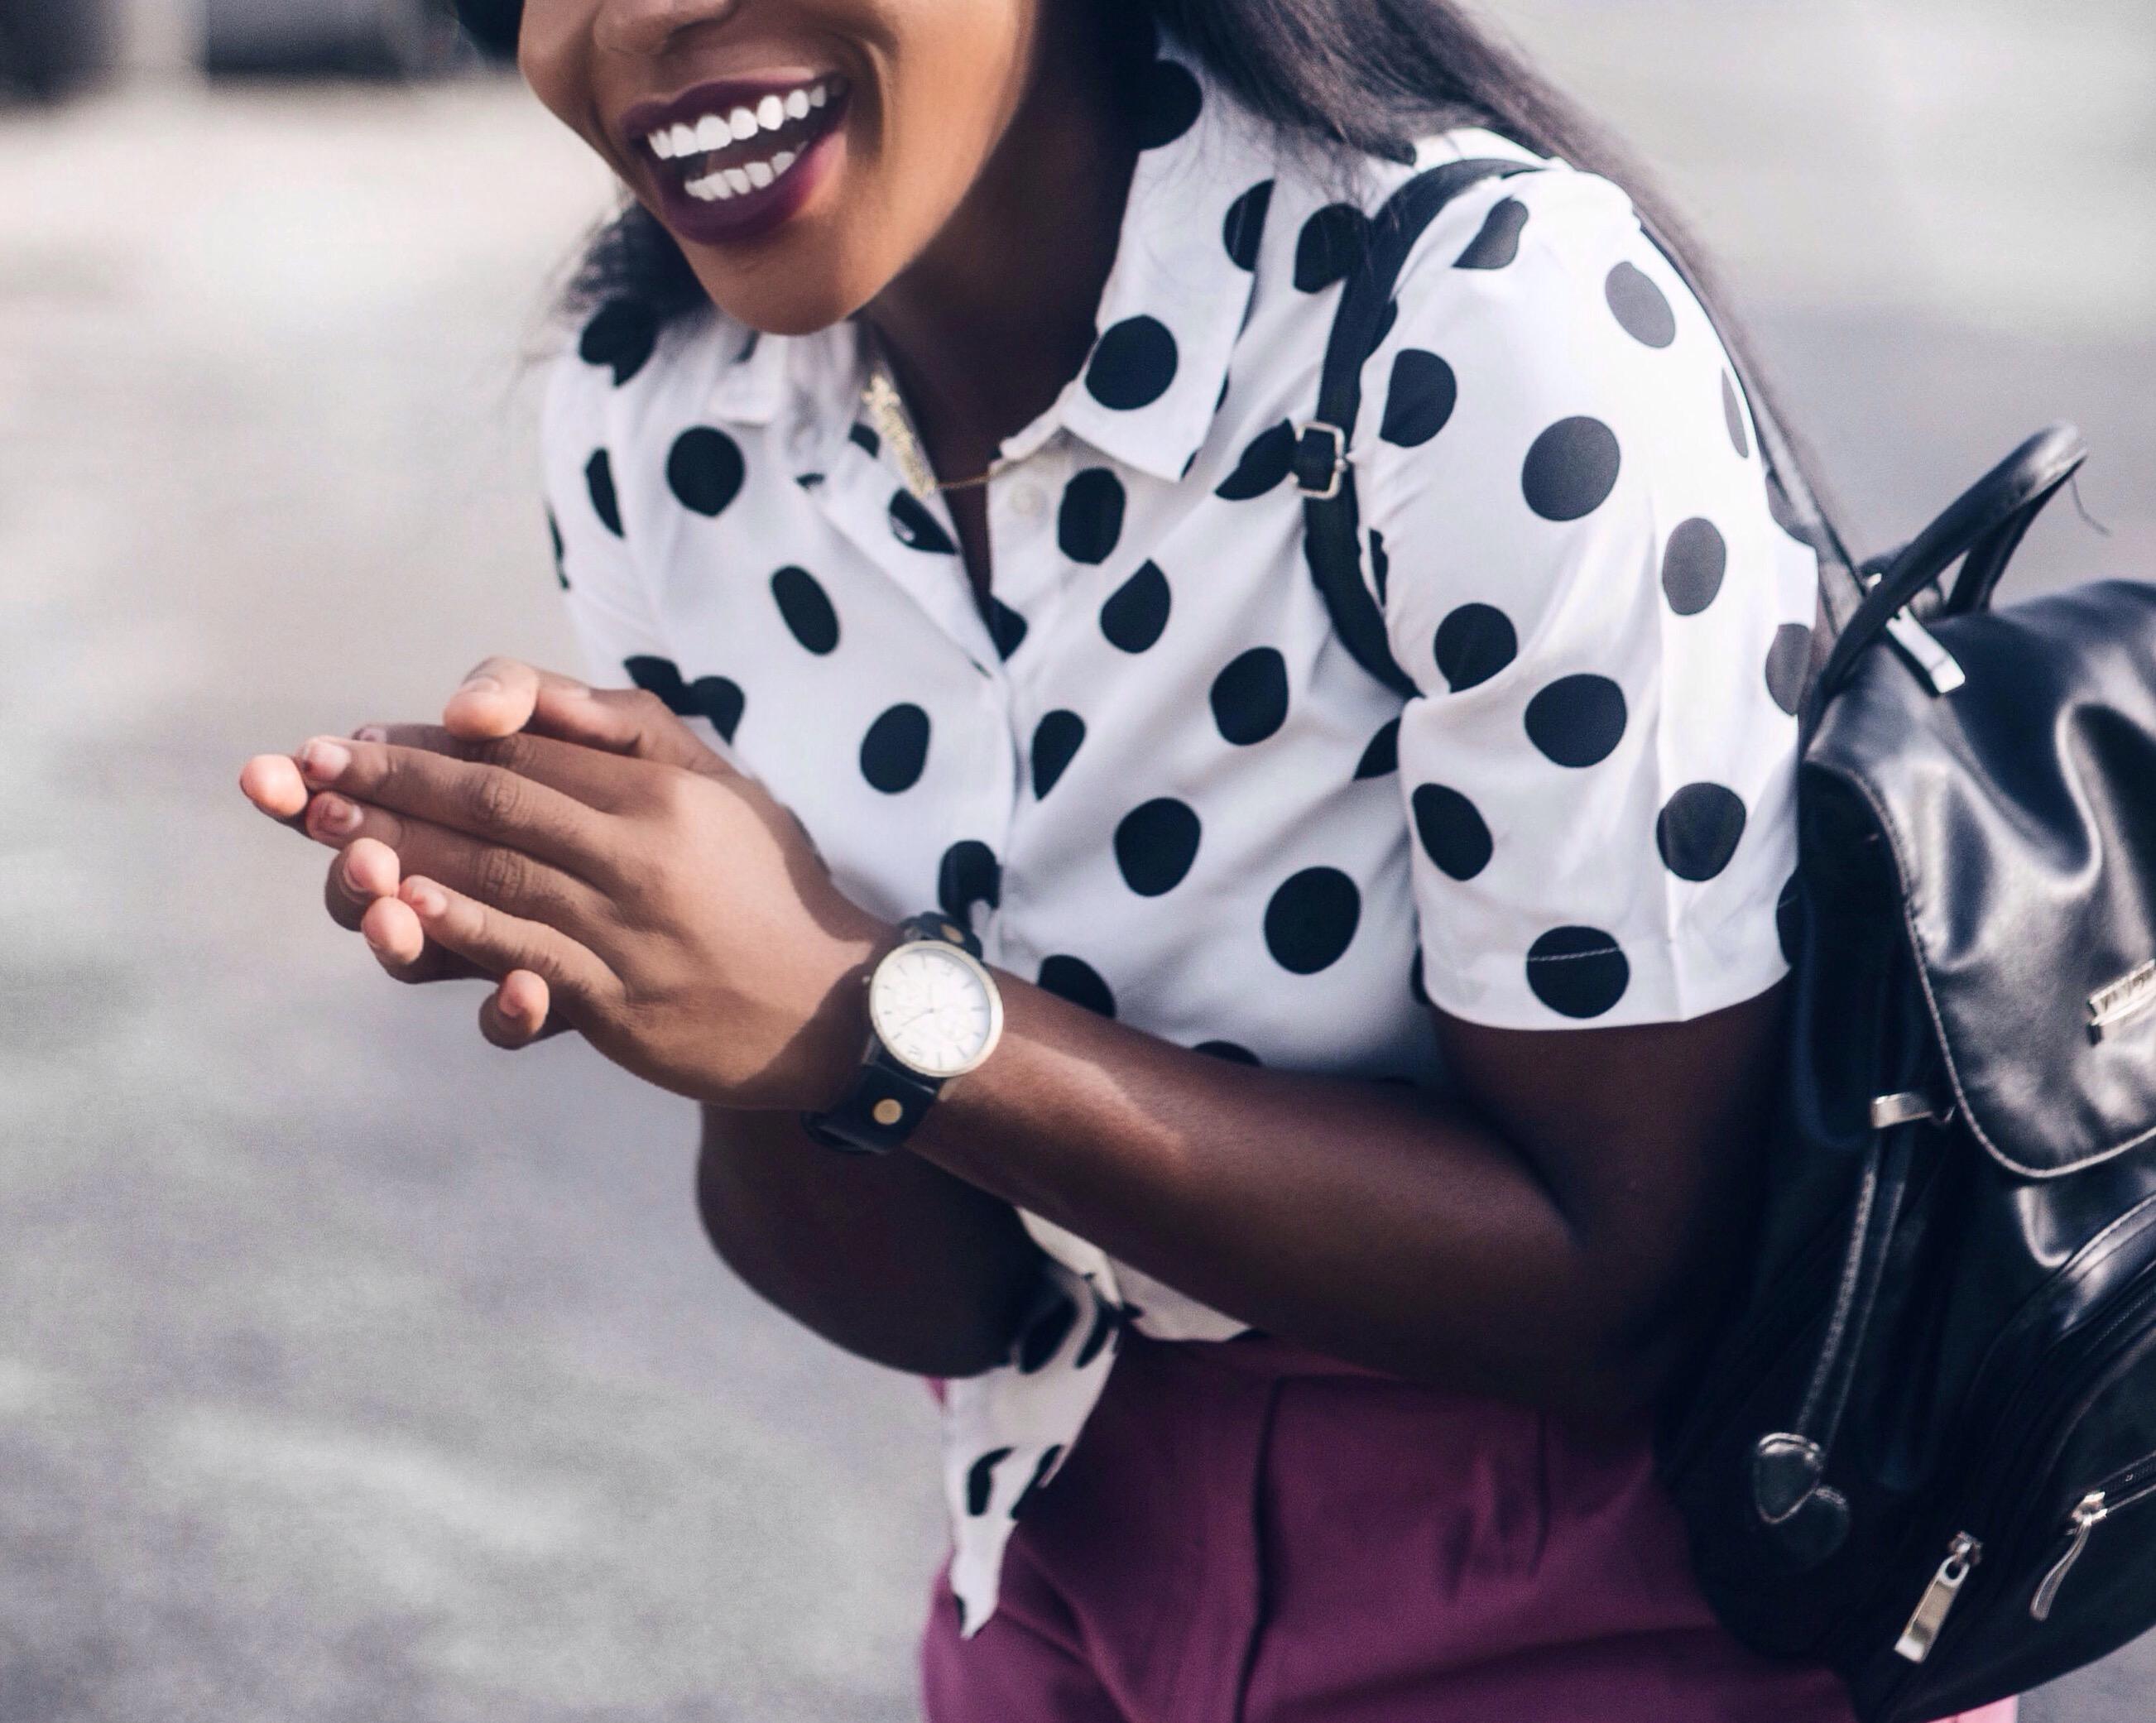 happiness, how to dress happy, polka dots